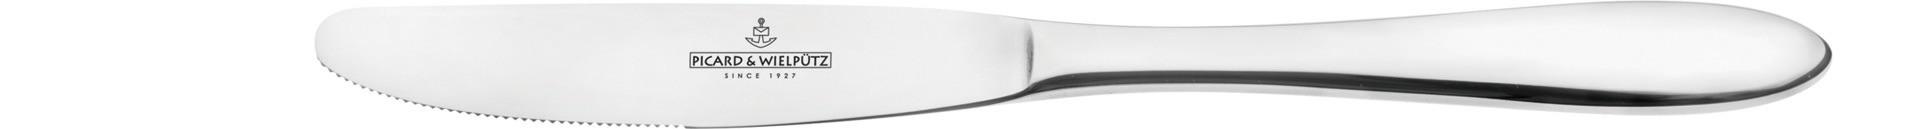 Bozen, Menümesser Monoblock 232 mm poliert